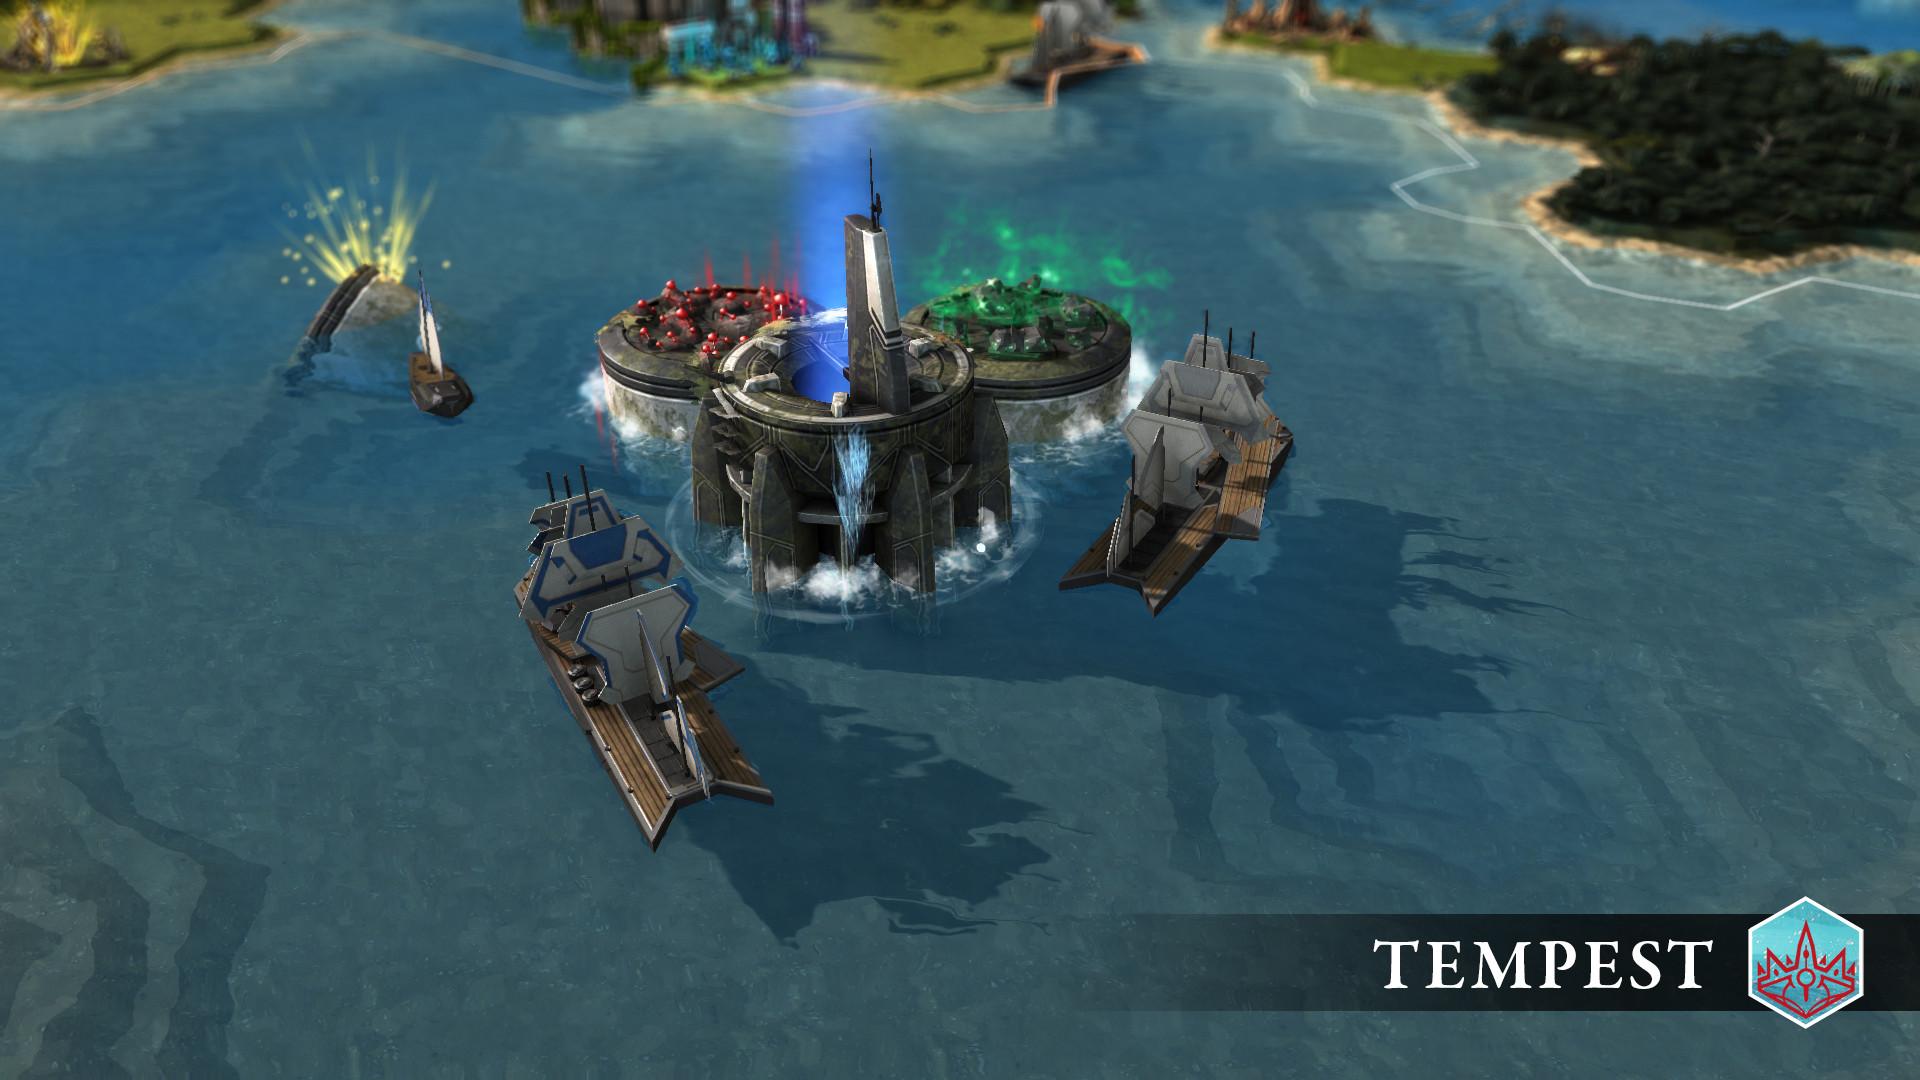 el_tempest_fortresse_warfleet.jpg - Endless Legend